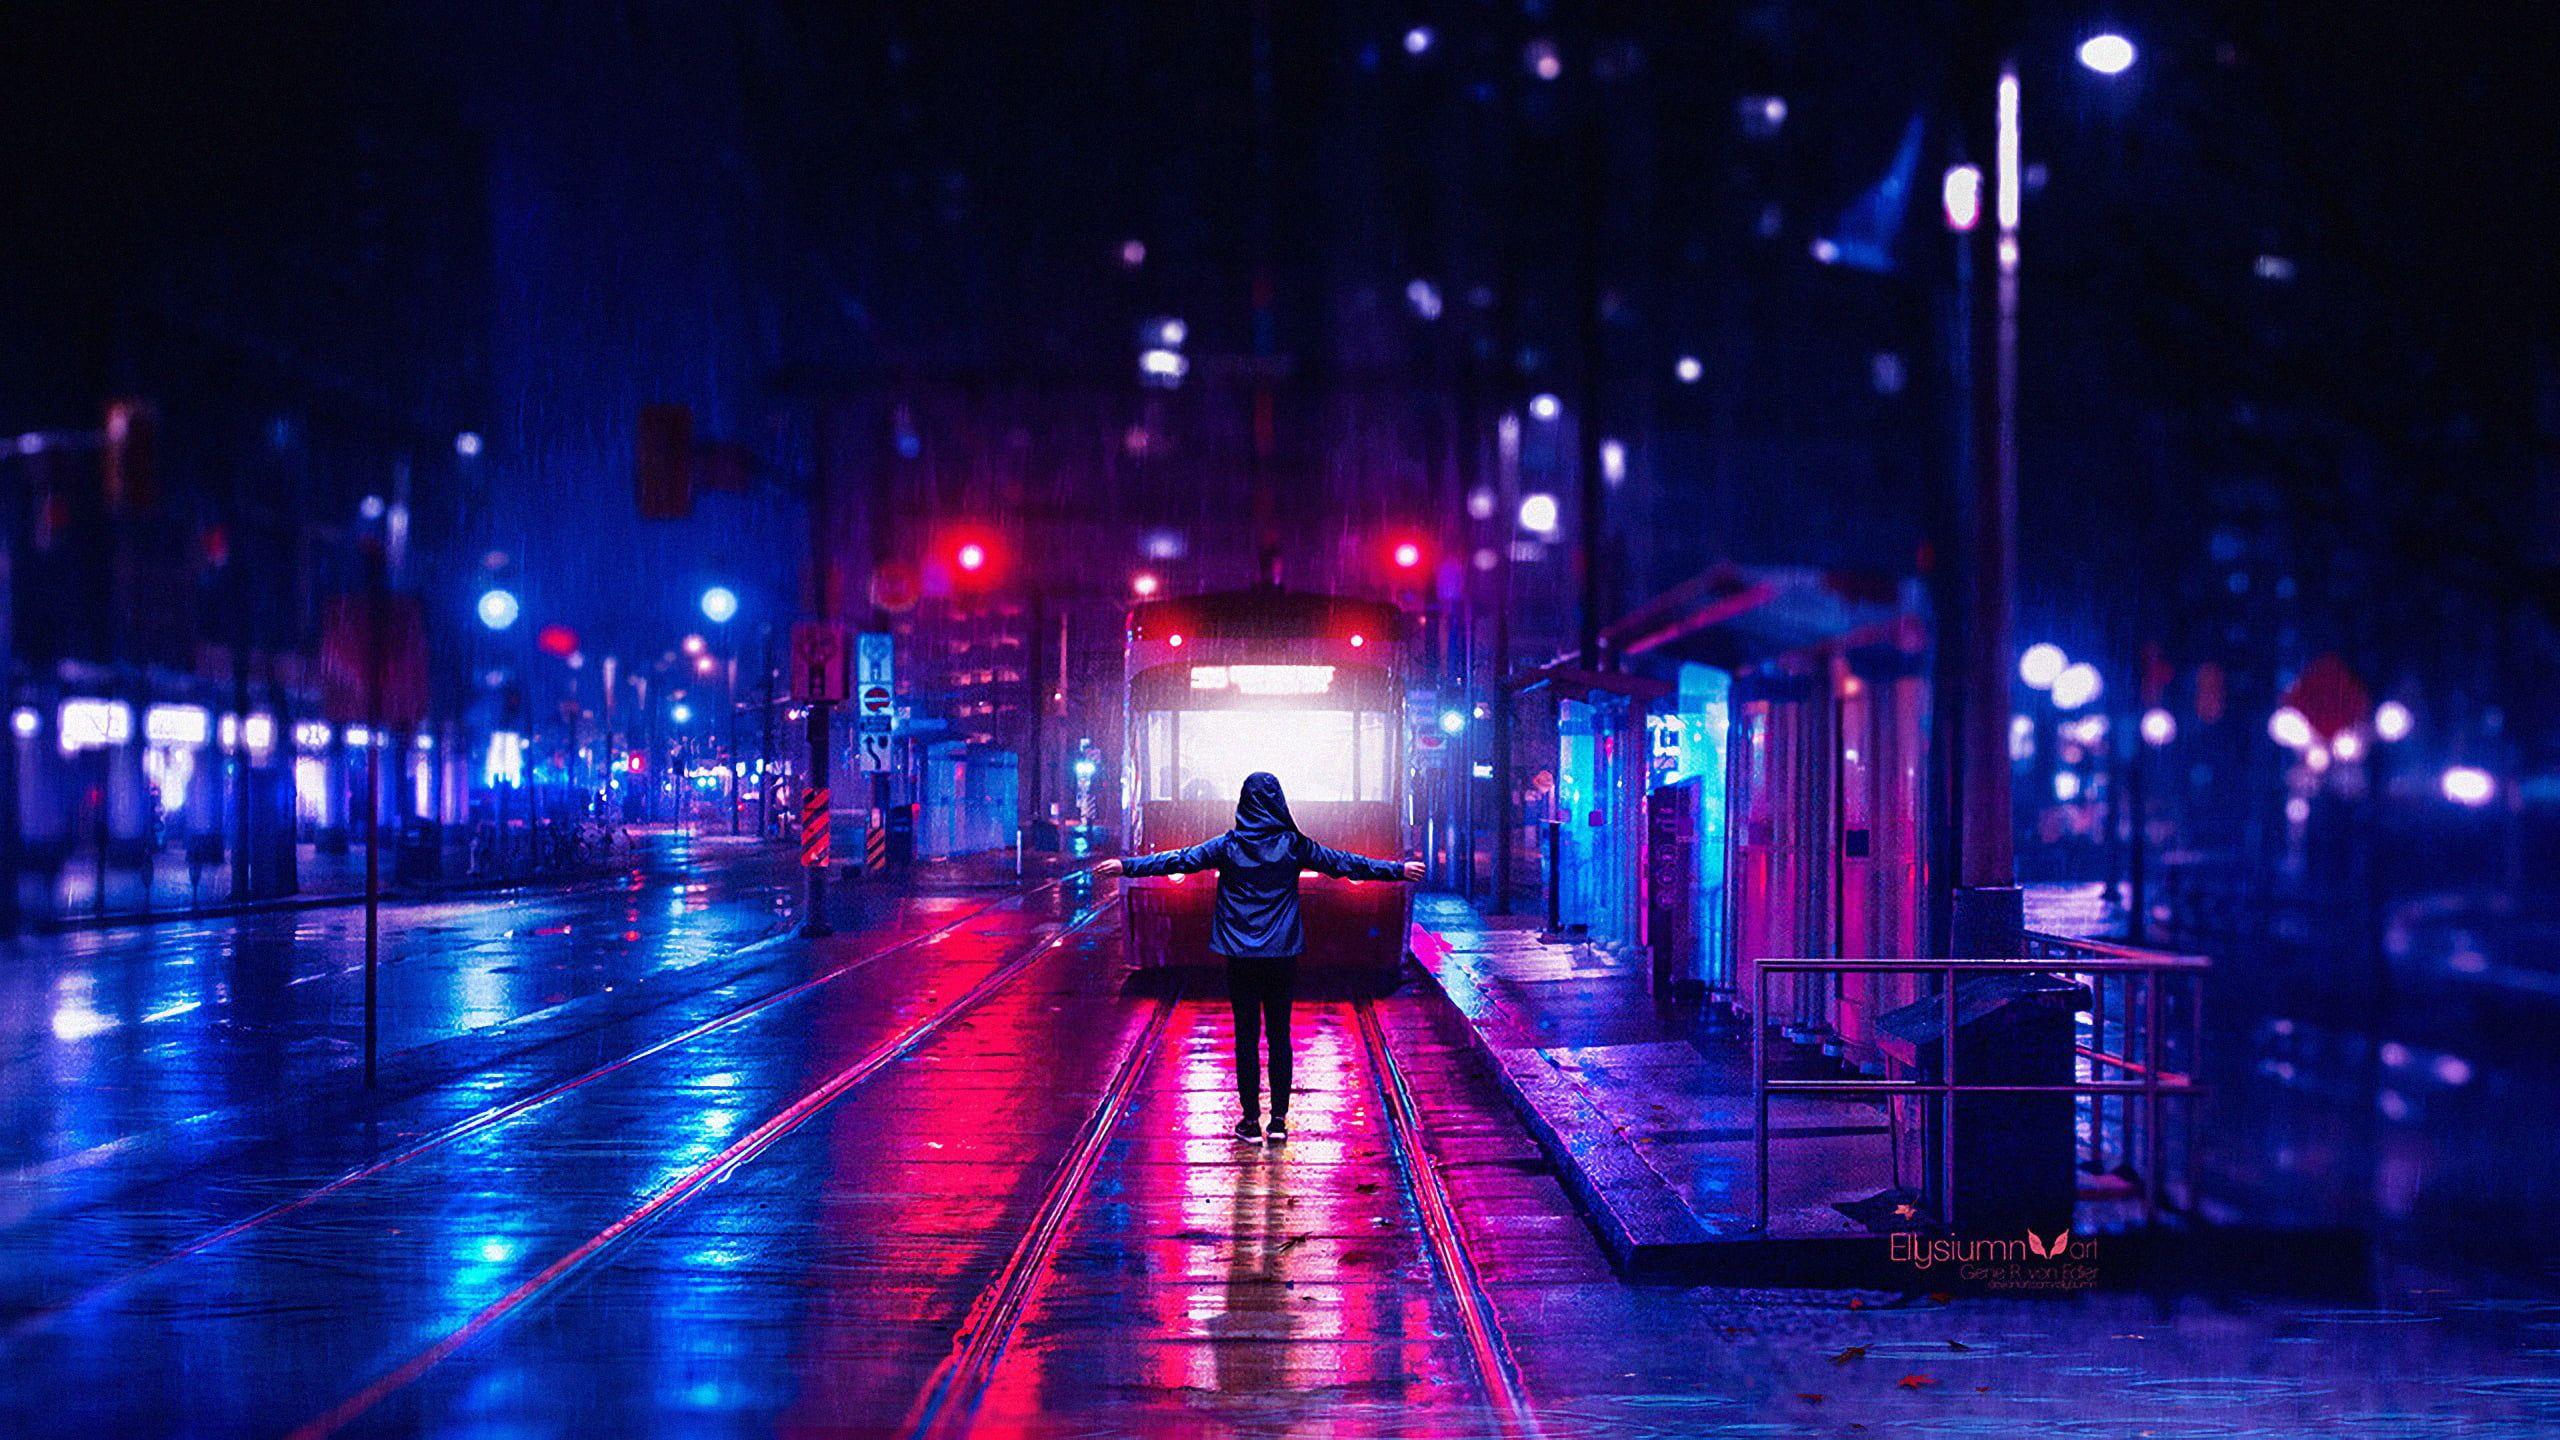 digital art city lights neon lights street light train station concept art